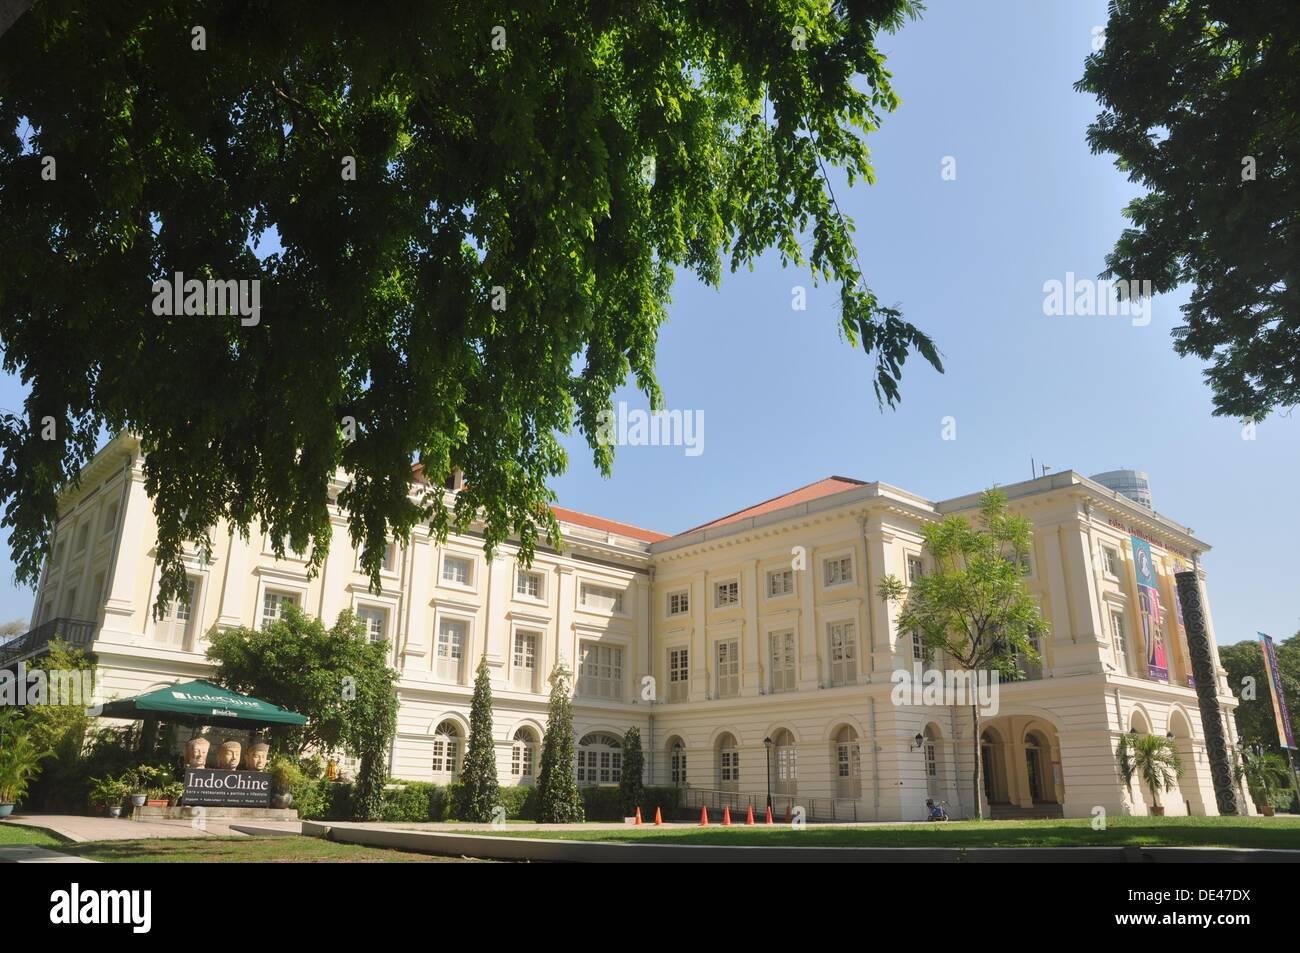 Singapore: the Asian Civilisations Museum - Stock Image